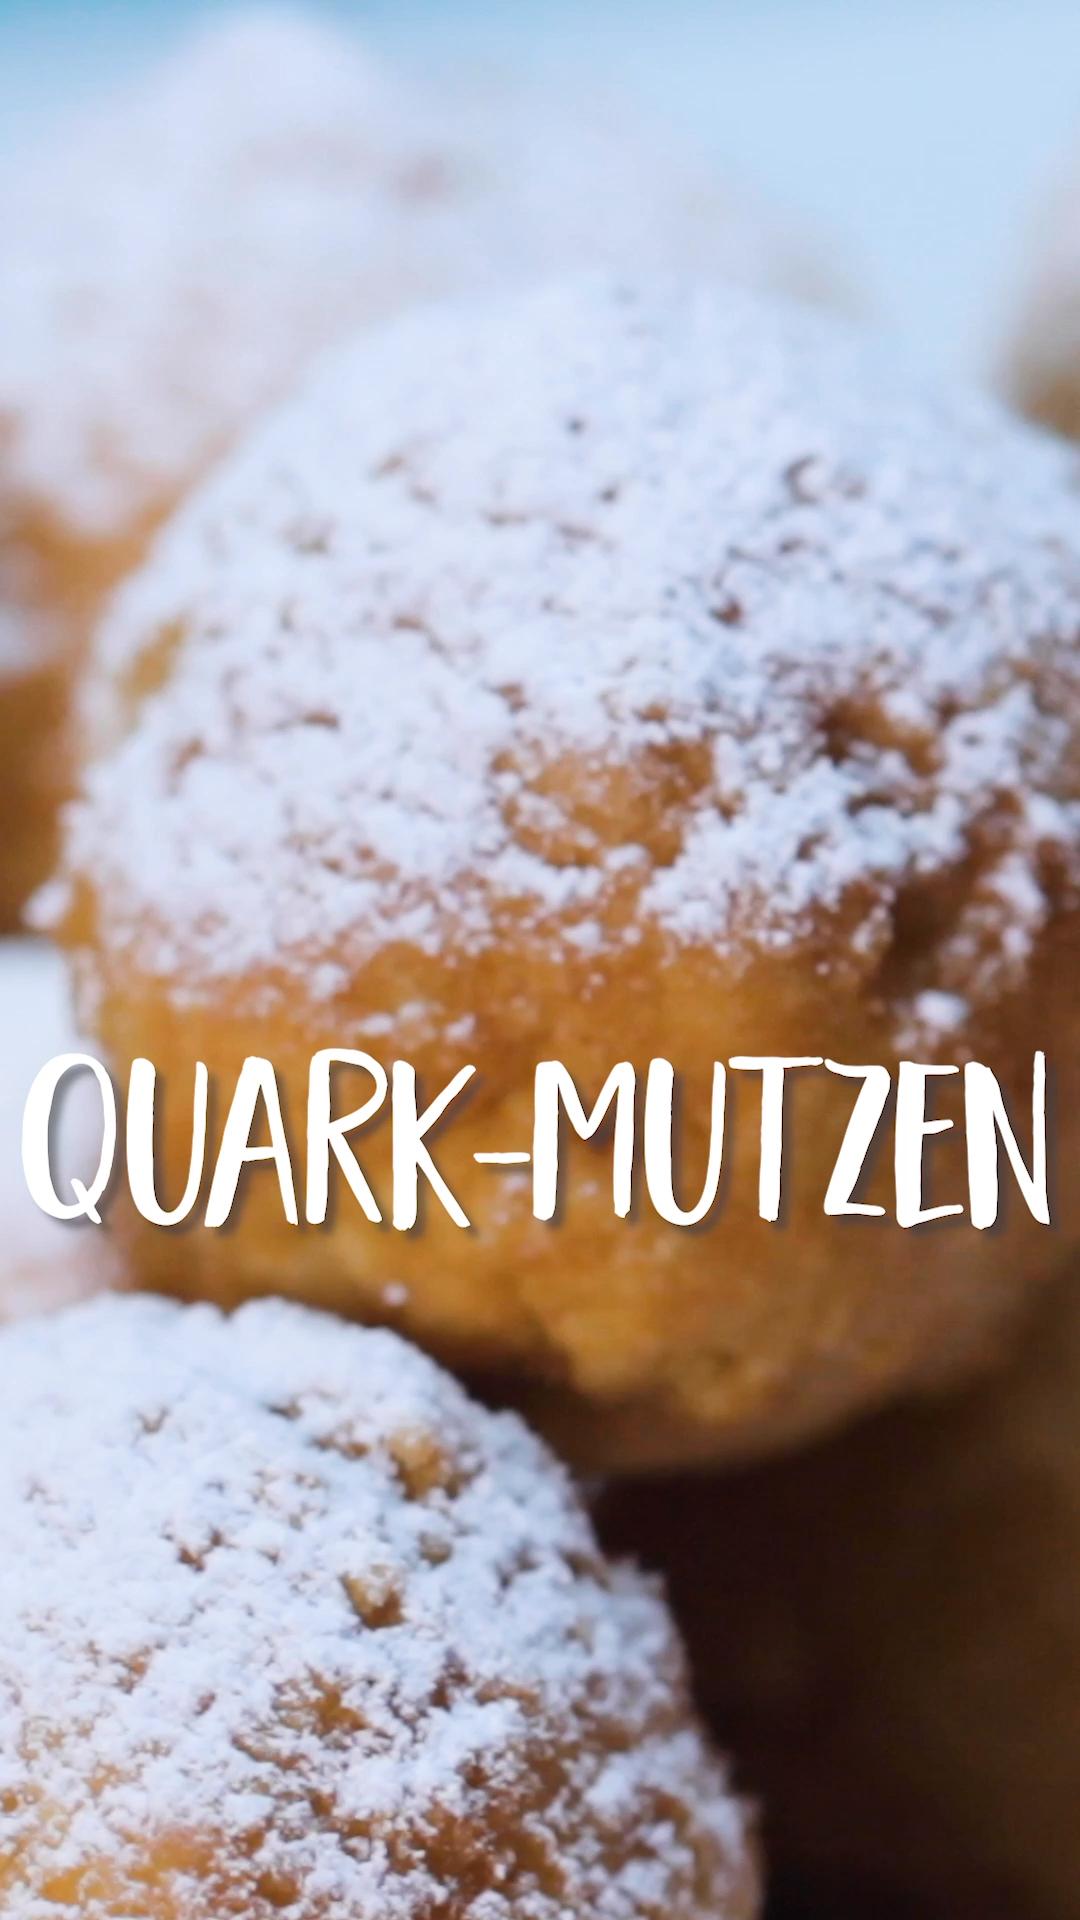 Quark-Mutzen: Eine süße Versuchung – Carey&CleanEatingS